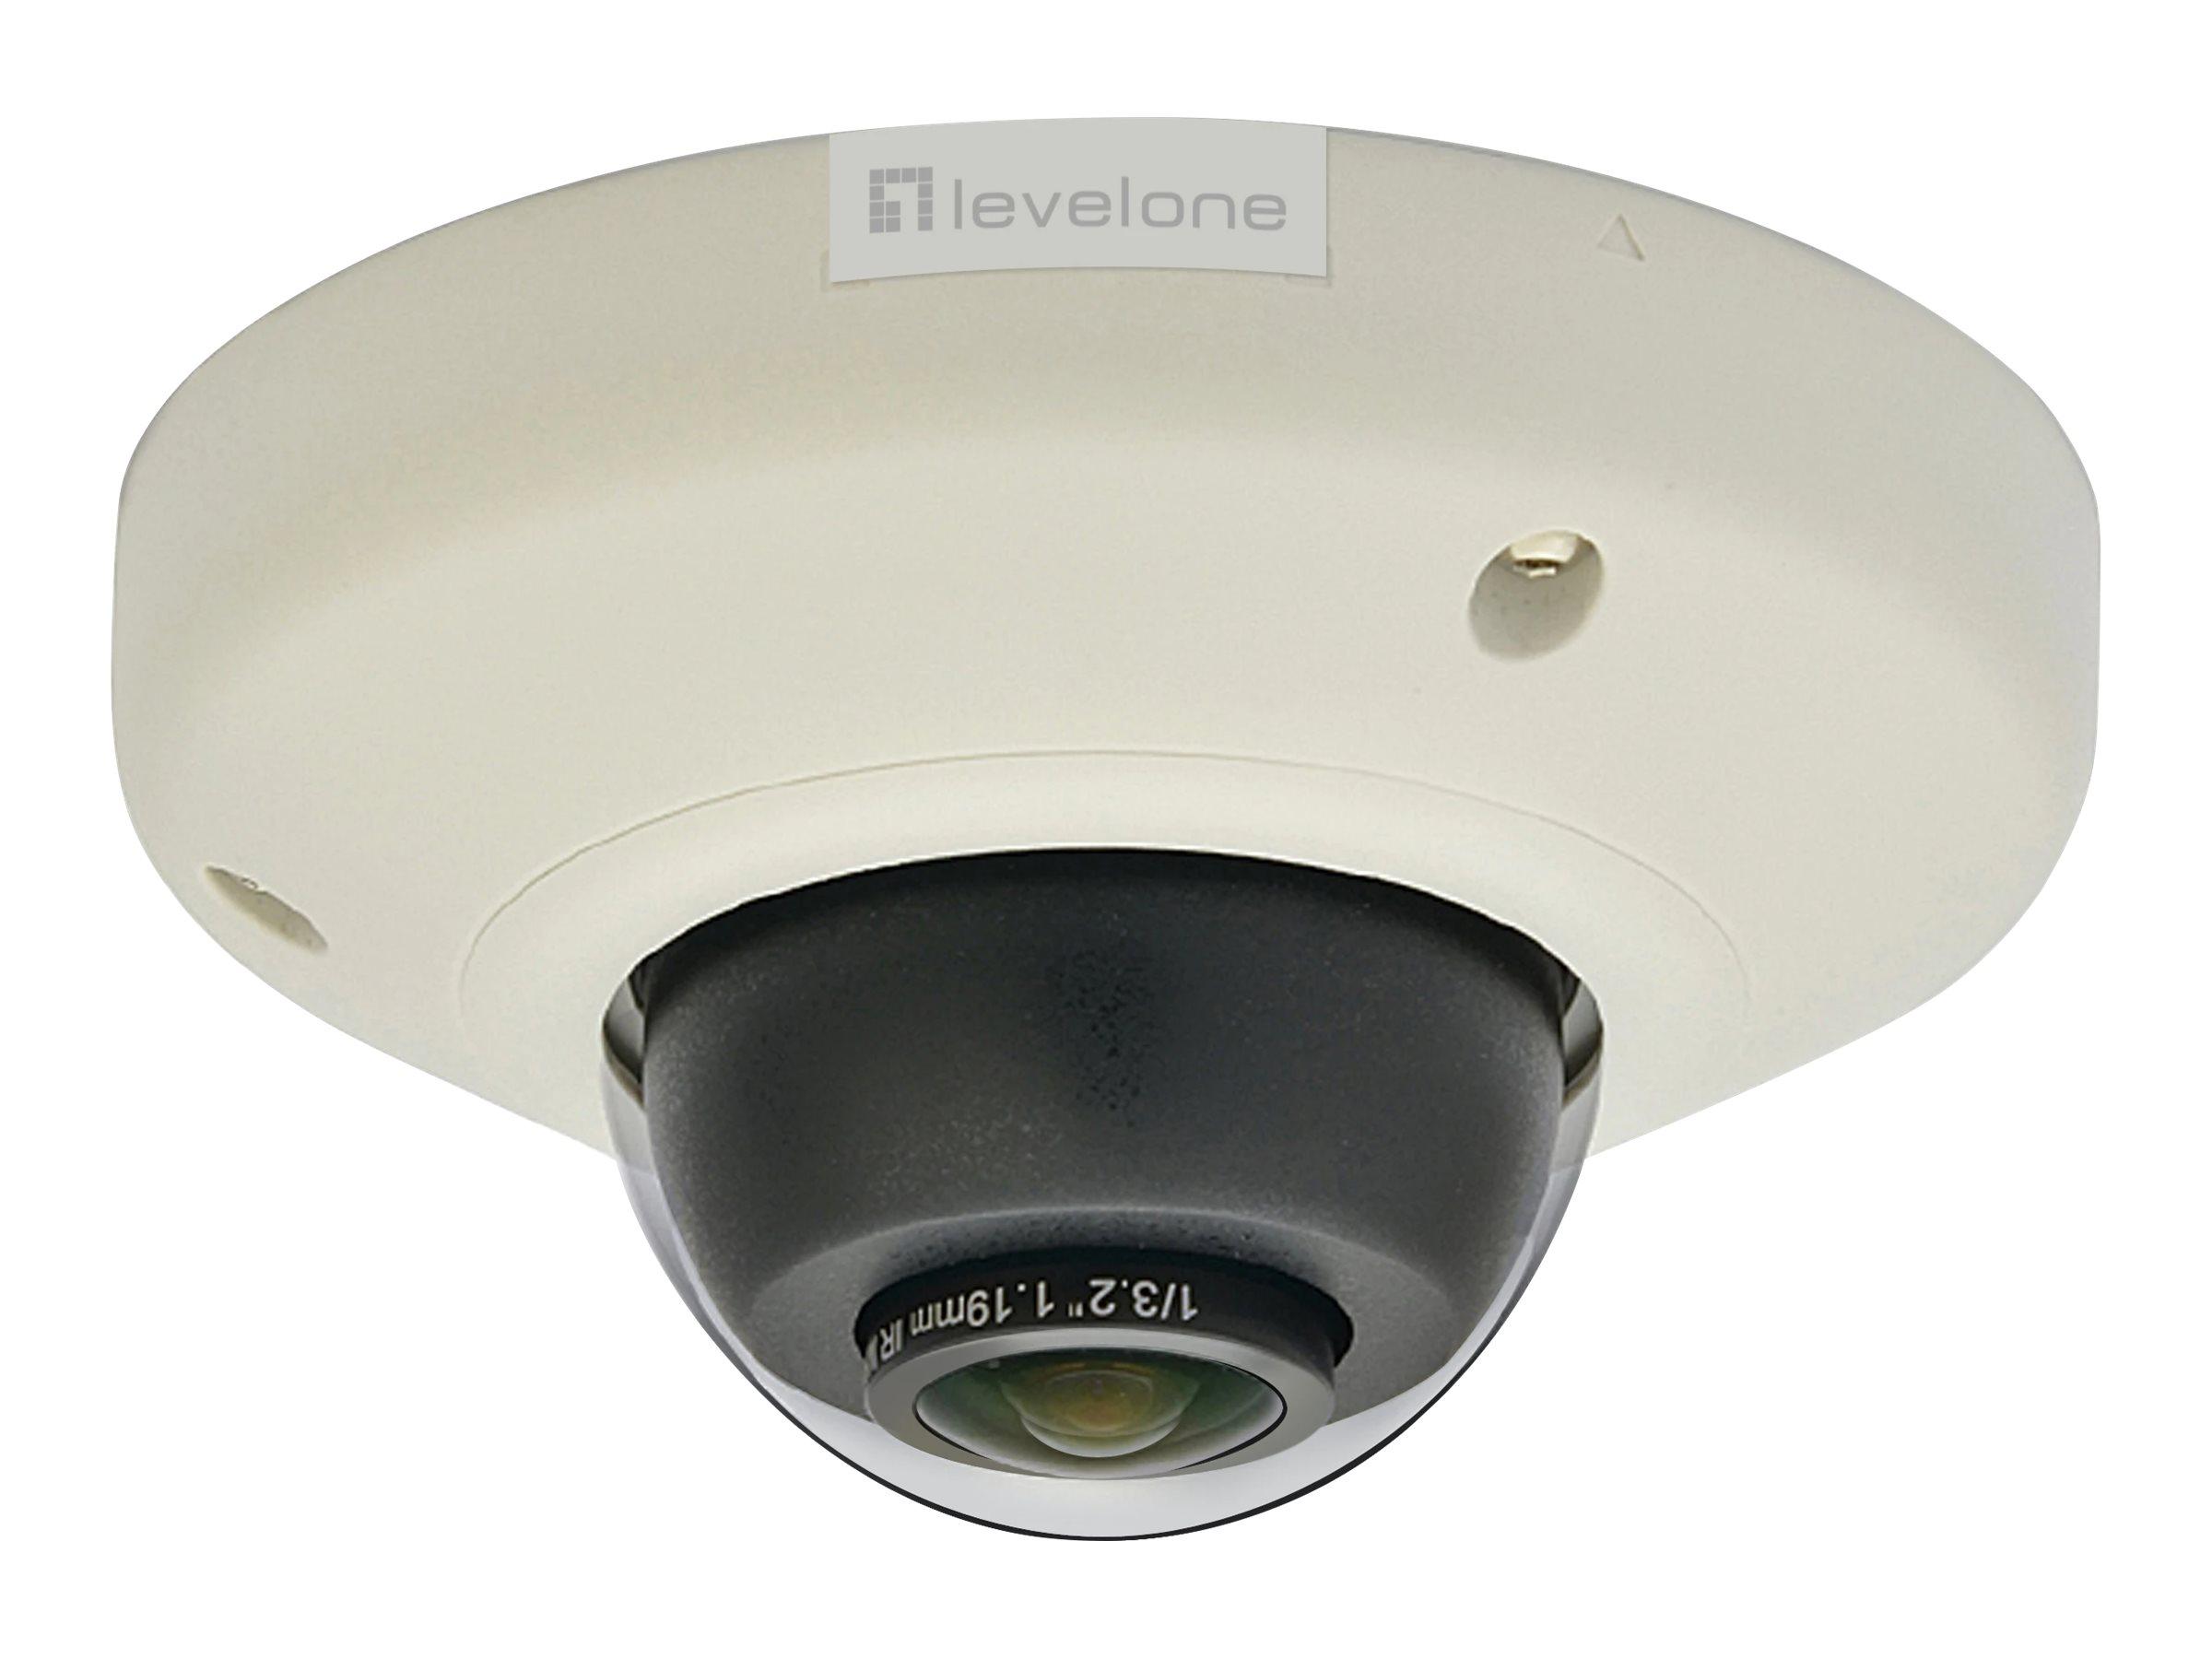 LevelOne FCS-3092 - panoramic camera - dome